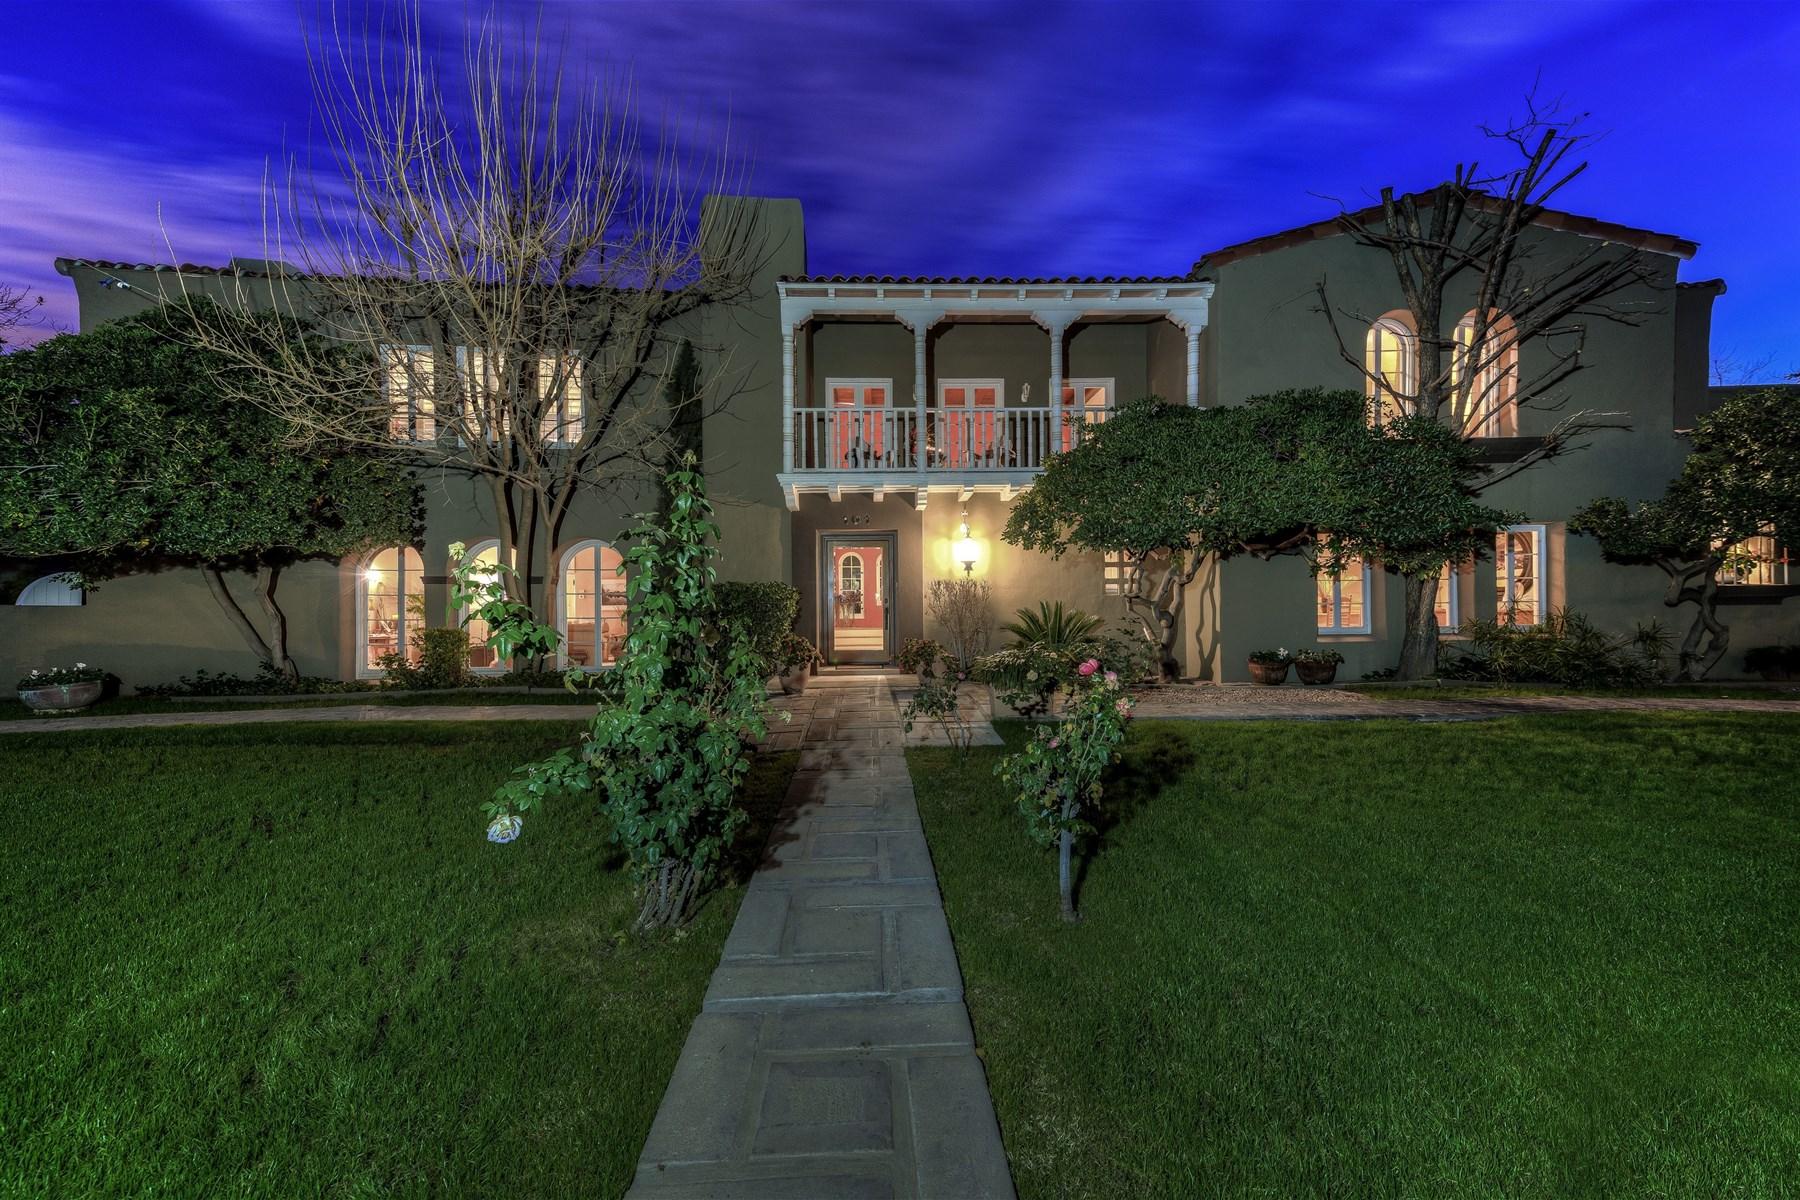 Casa Unifamiliar por un Venta en Incredible 1935 adobe home with classic Monterey architecture 101 E Country Club Dr Phoenix, Arizona 85014 Estados Unidos